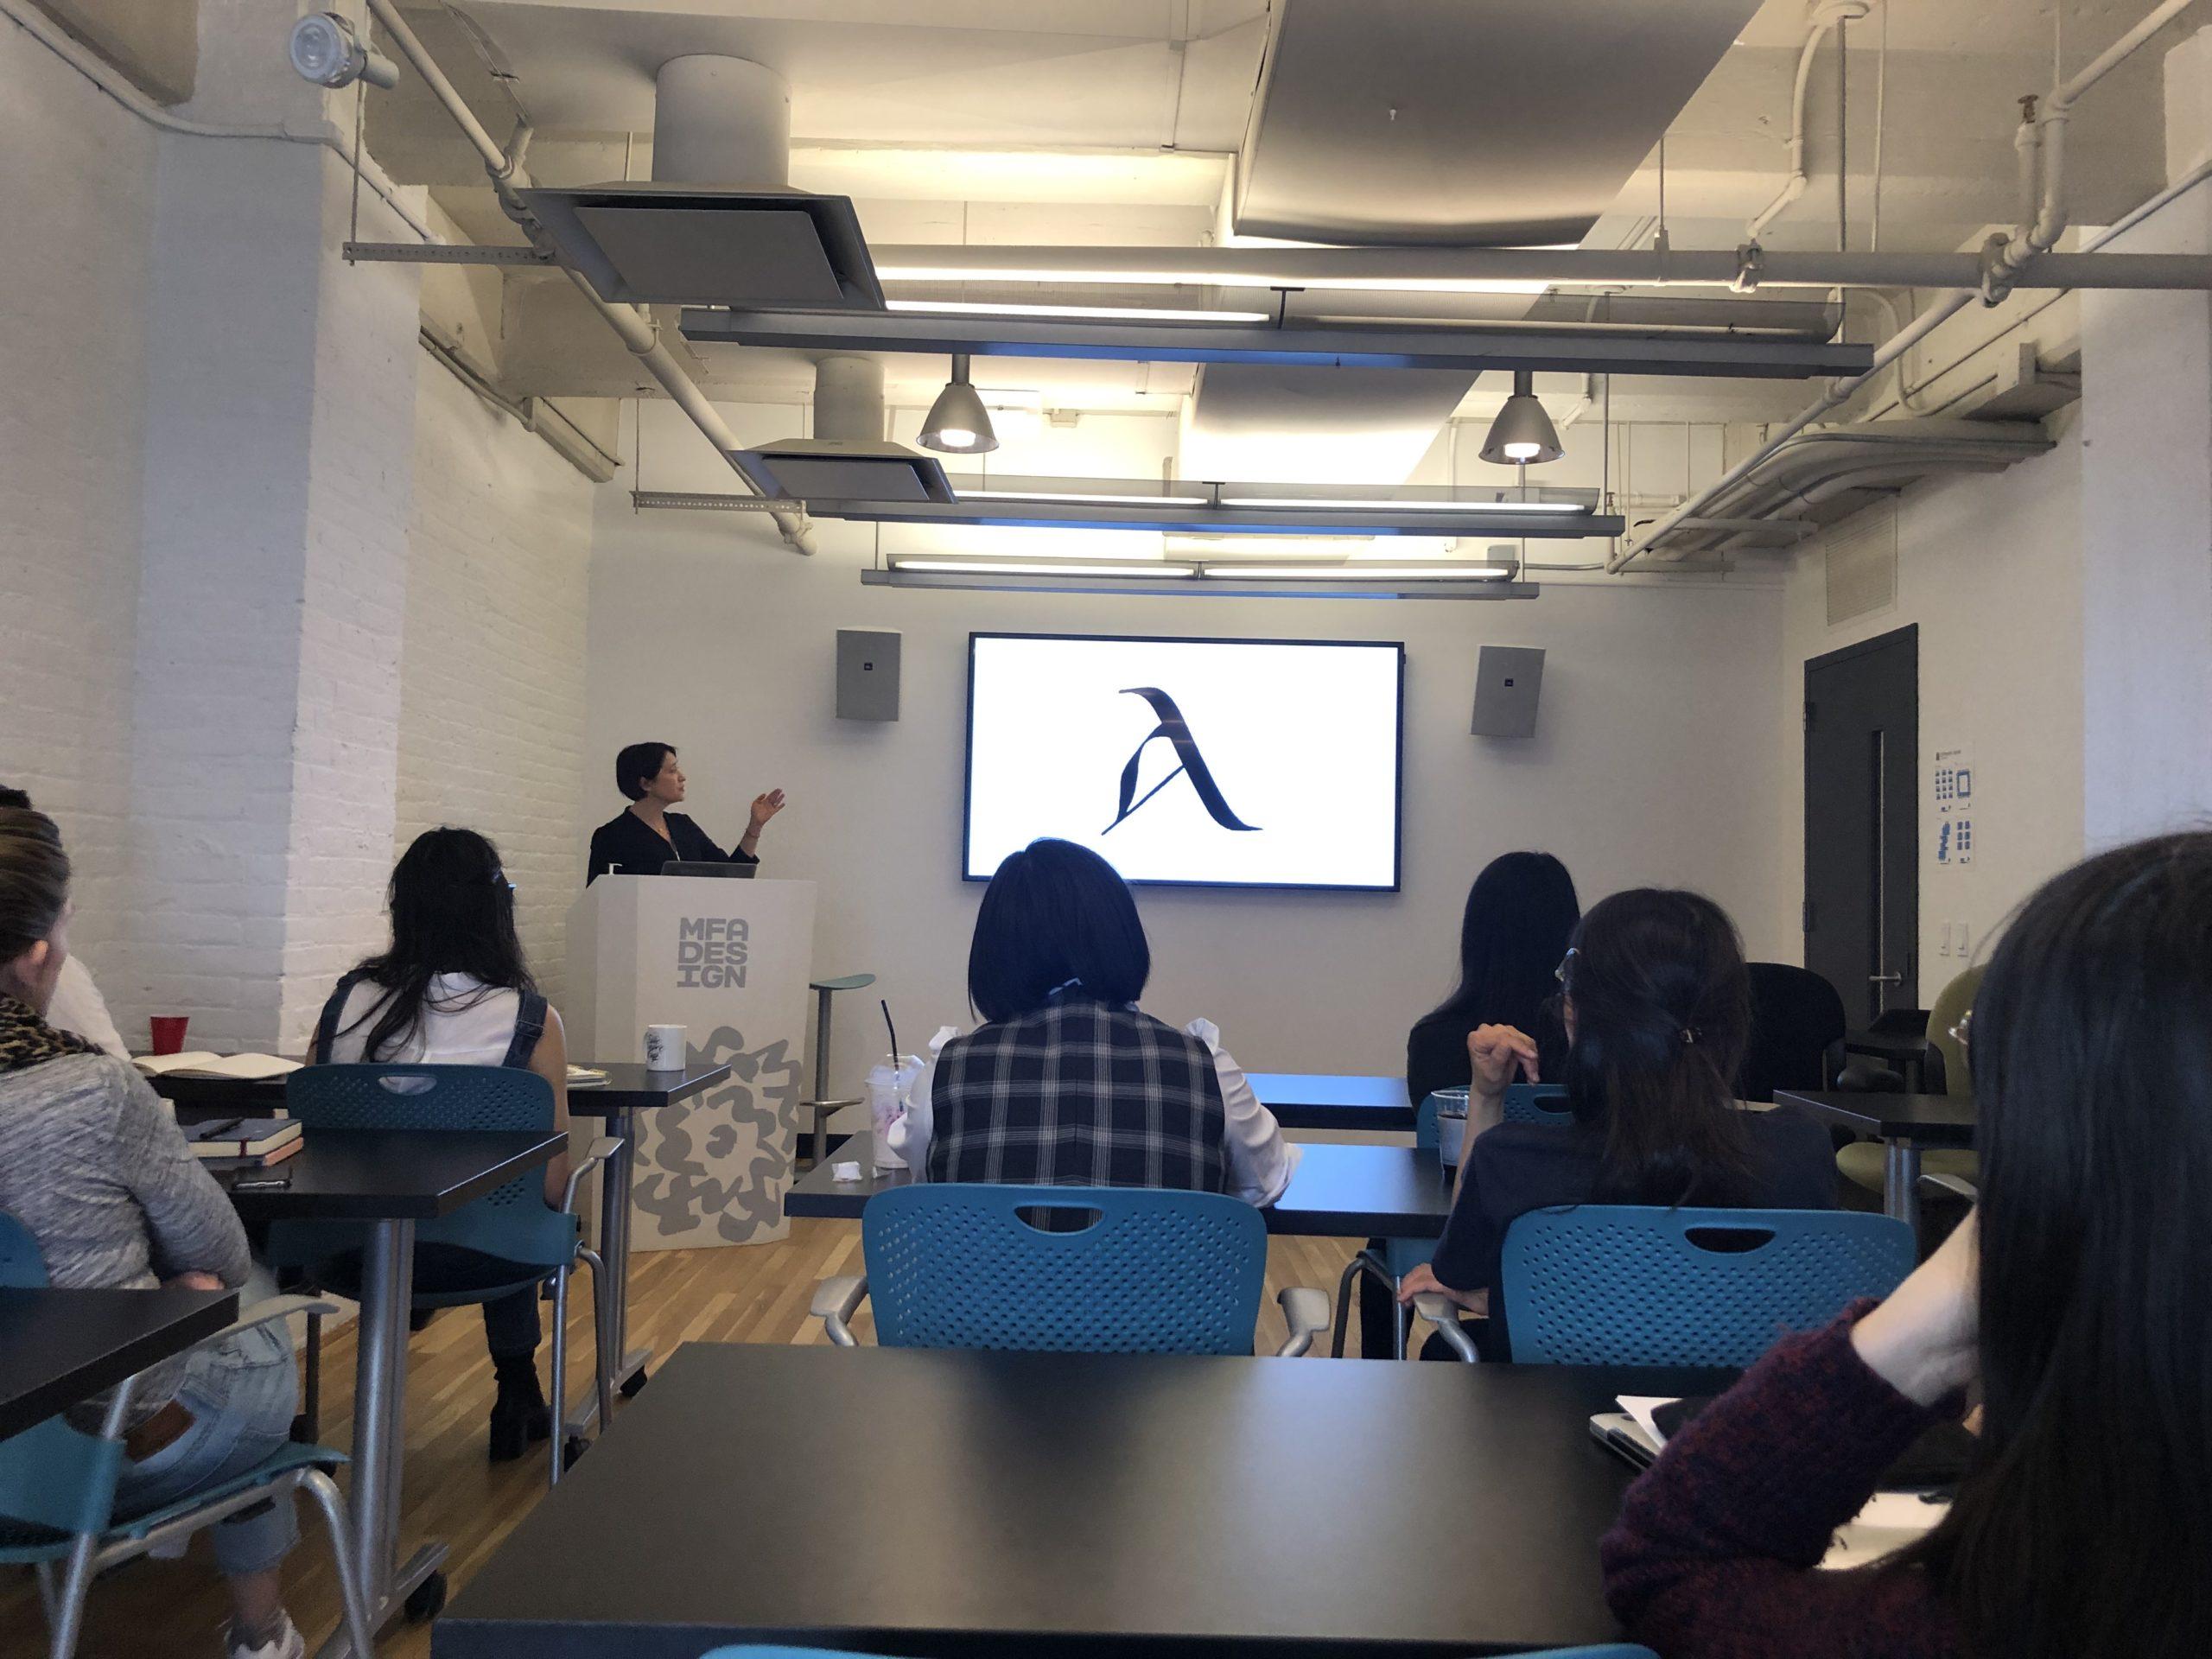 Maya Kopytman's guest lecture showing slides